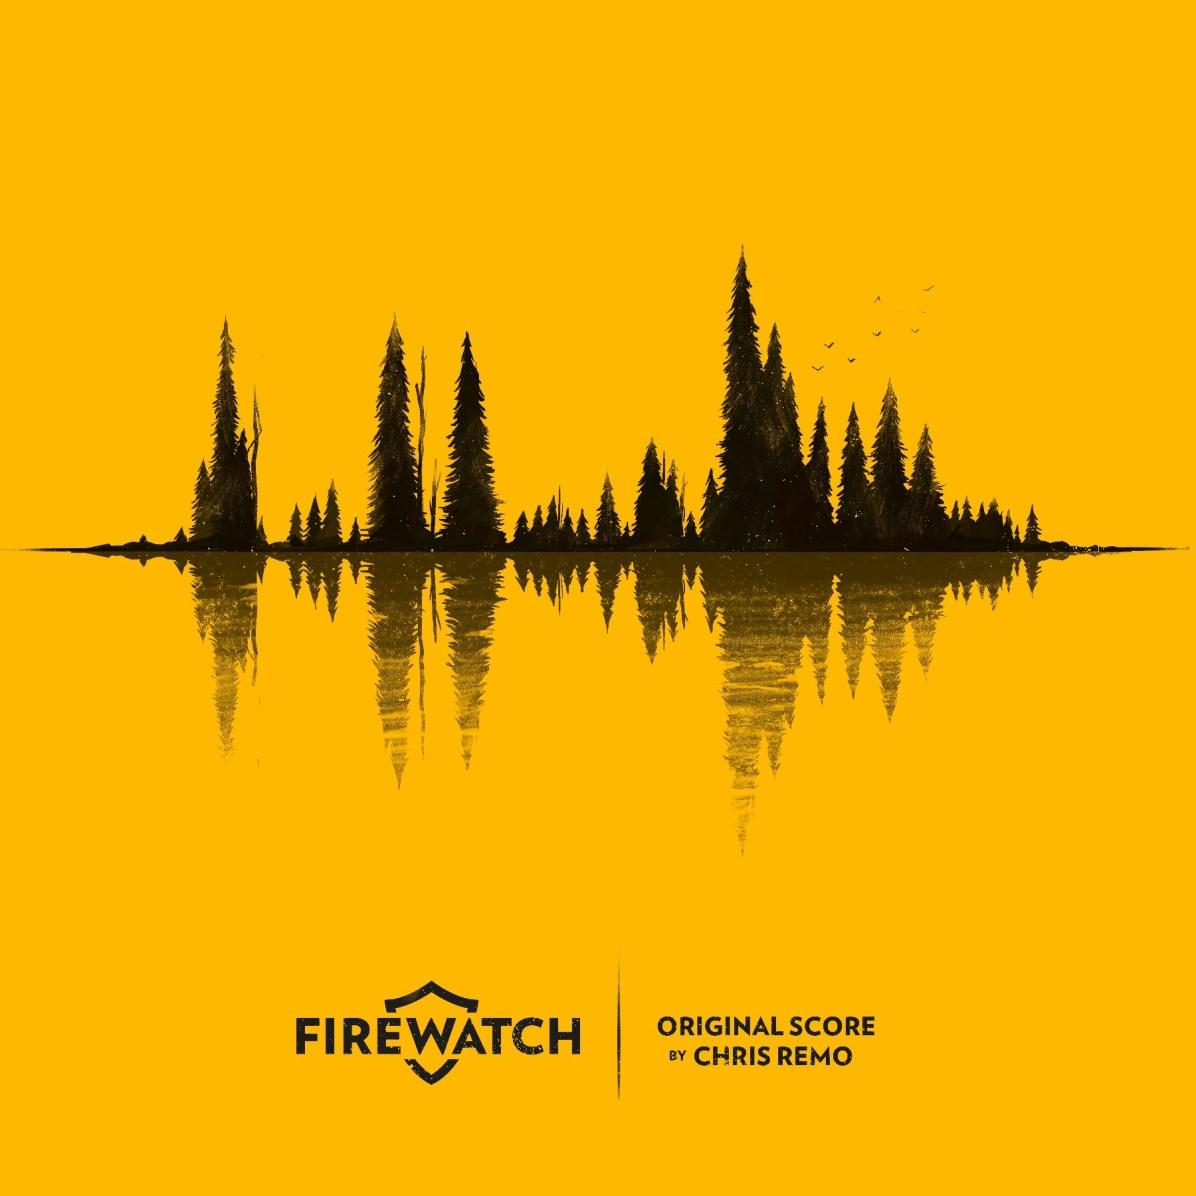 #1: Firewatch (Original)